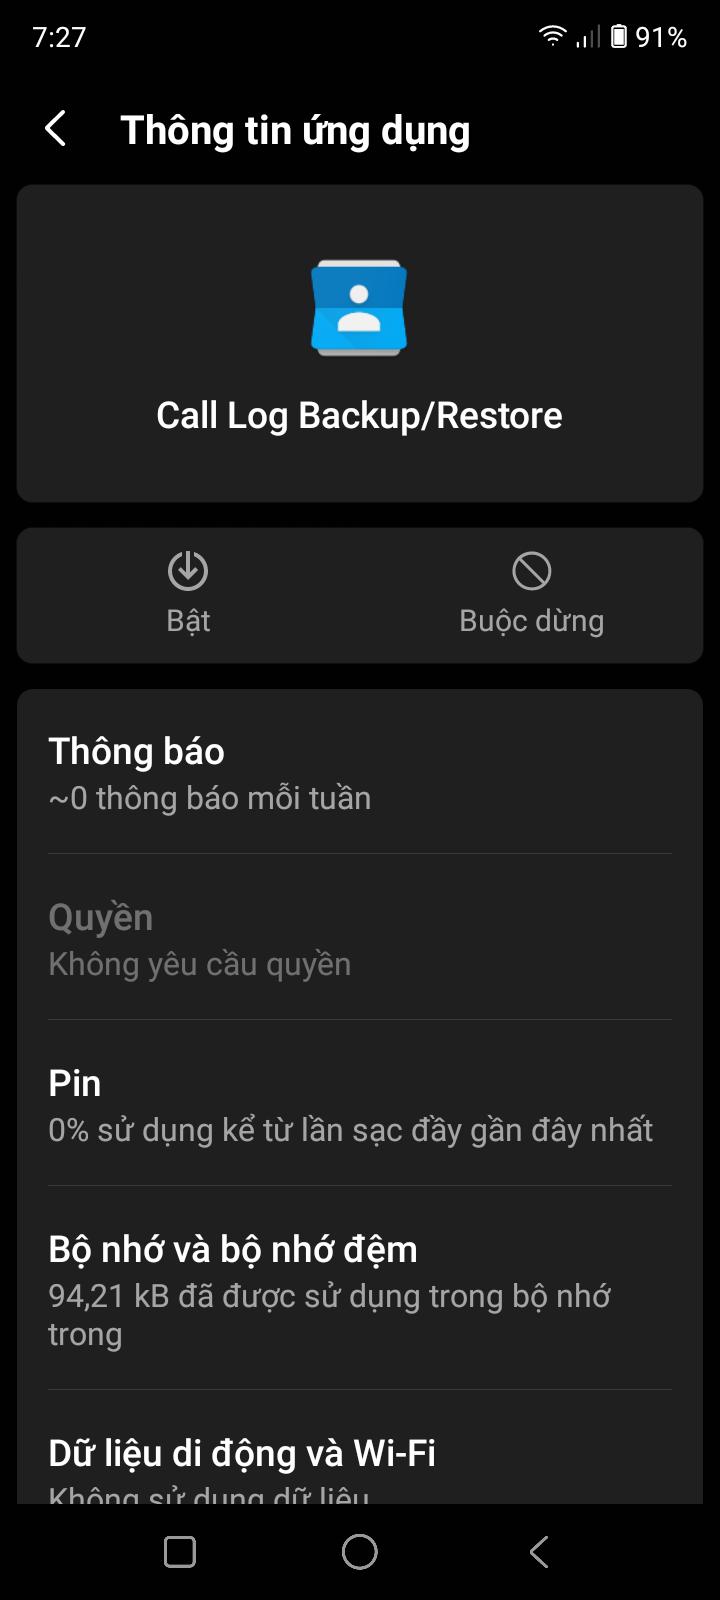 Screenshot_20210728-072732.png